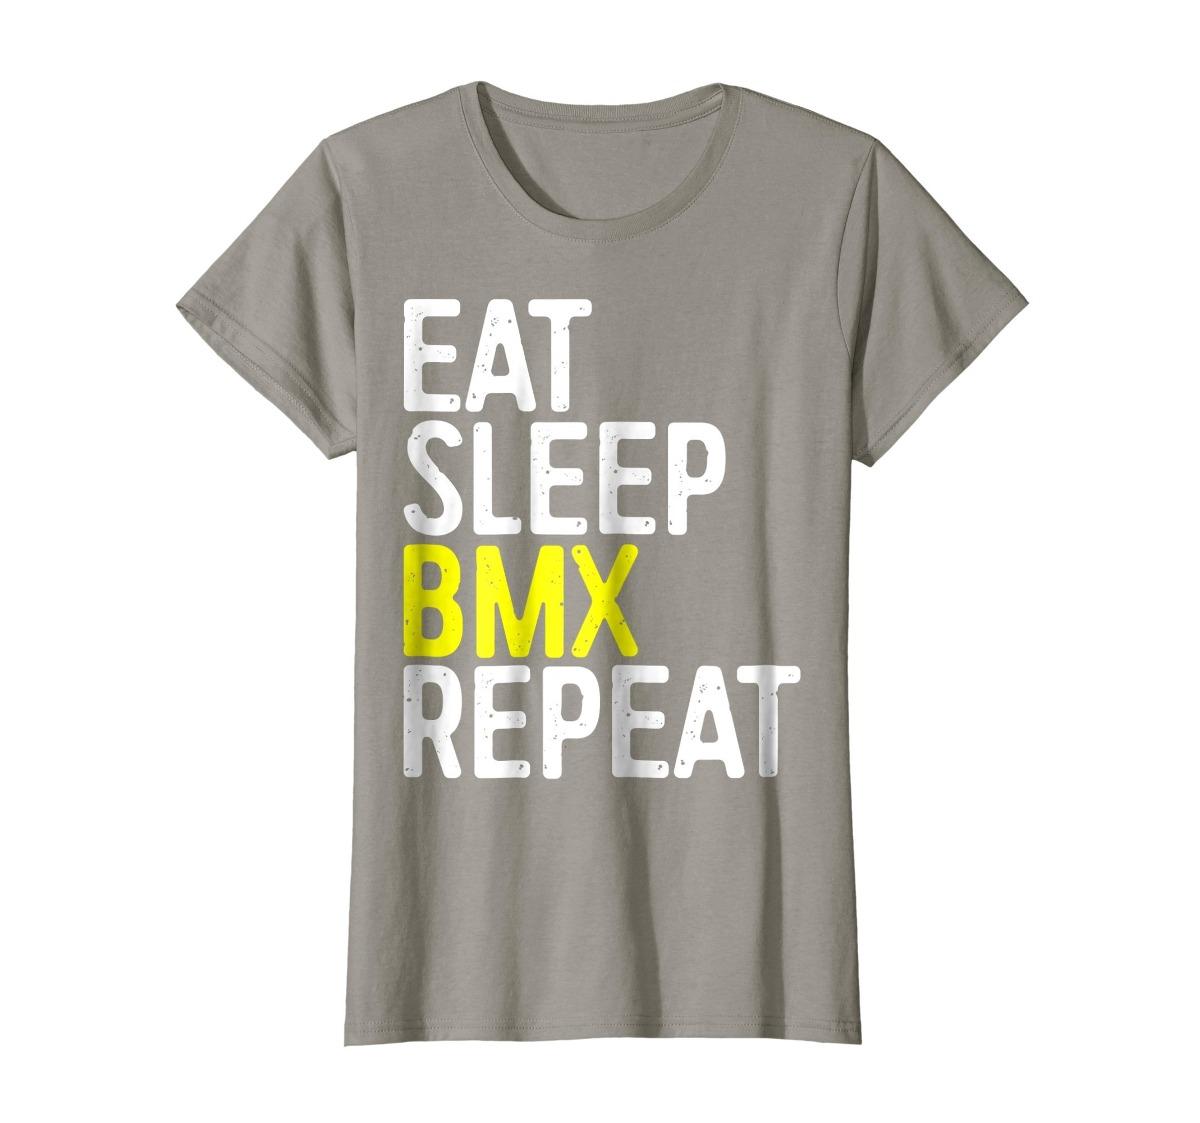 35eb4edbfe22e Camiseta Para Mujer Eat Sleep Bmx Repeat Camiseta Diverti - S  231 ...